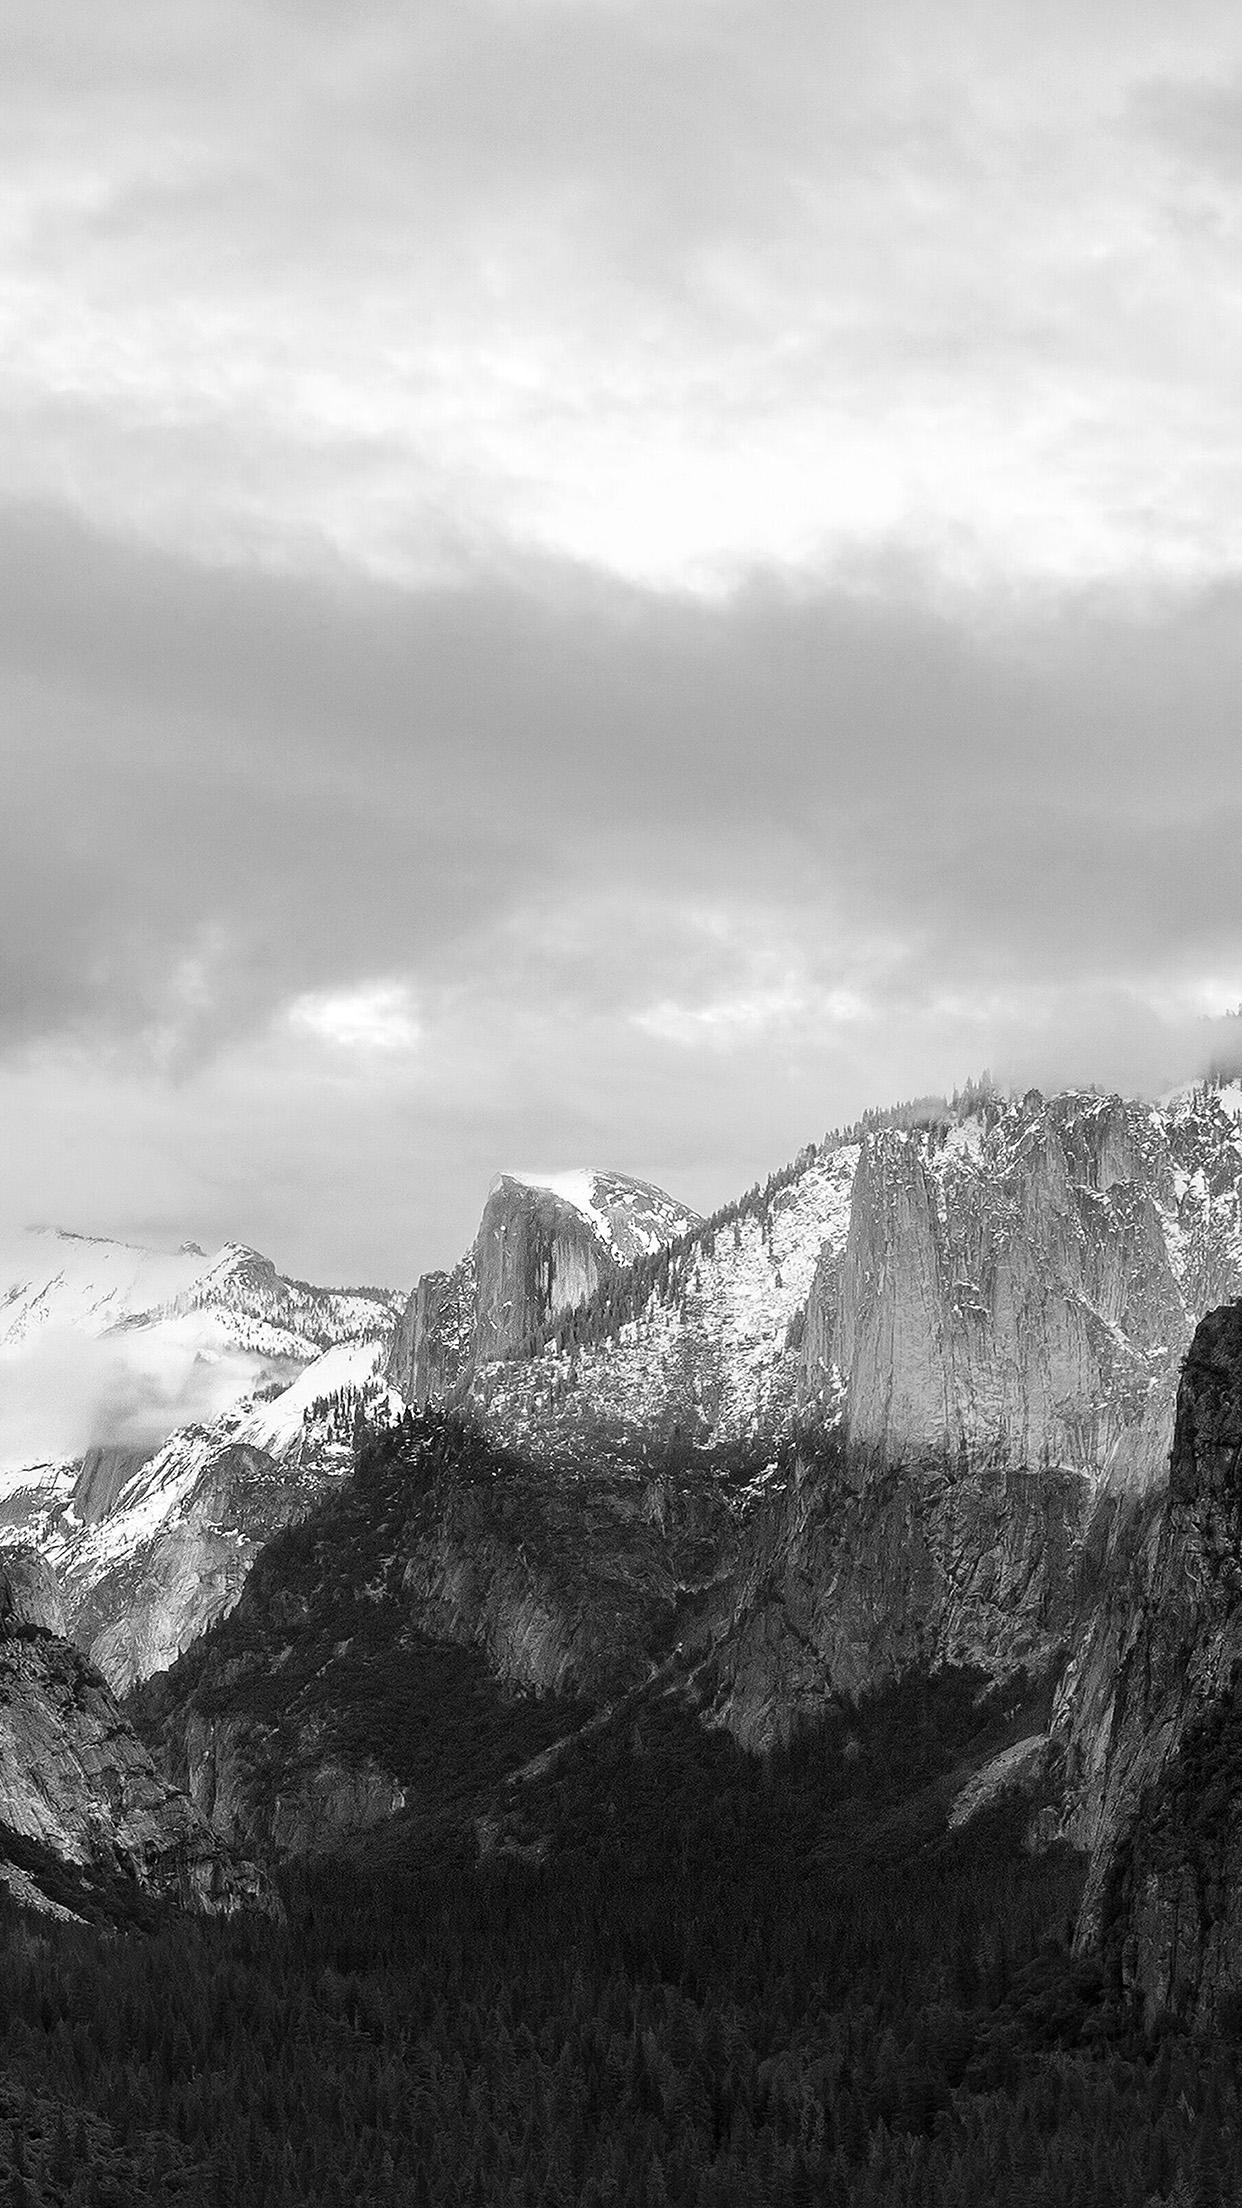 Mac Os X Yosemite Wallpaper Iphone 6 Os X Yosemite Iphone C